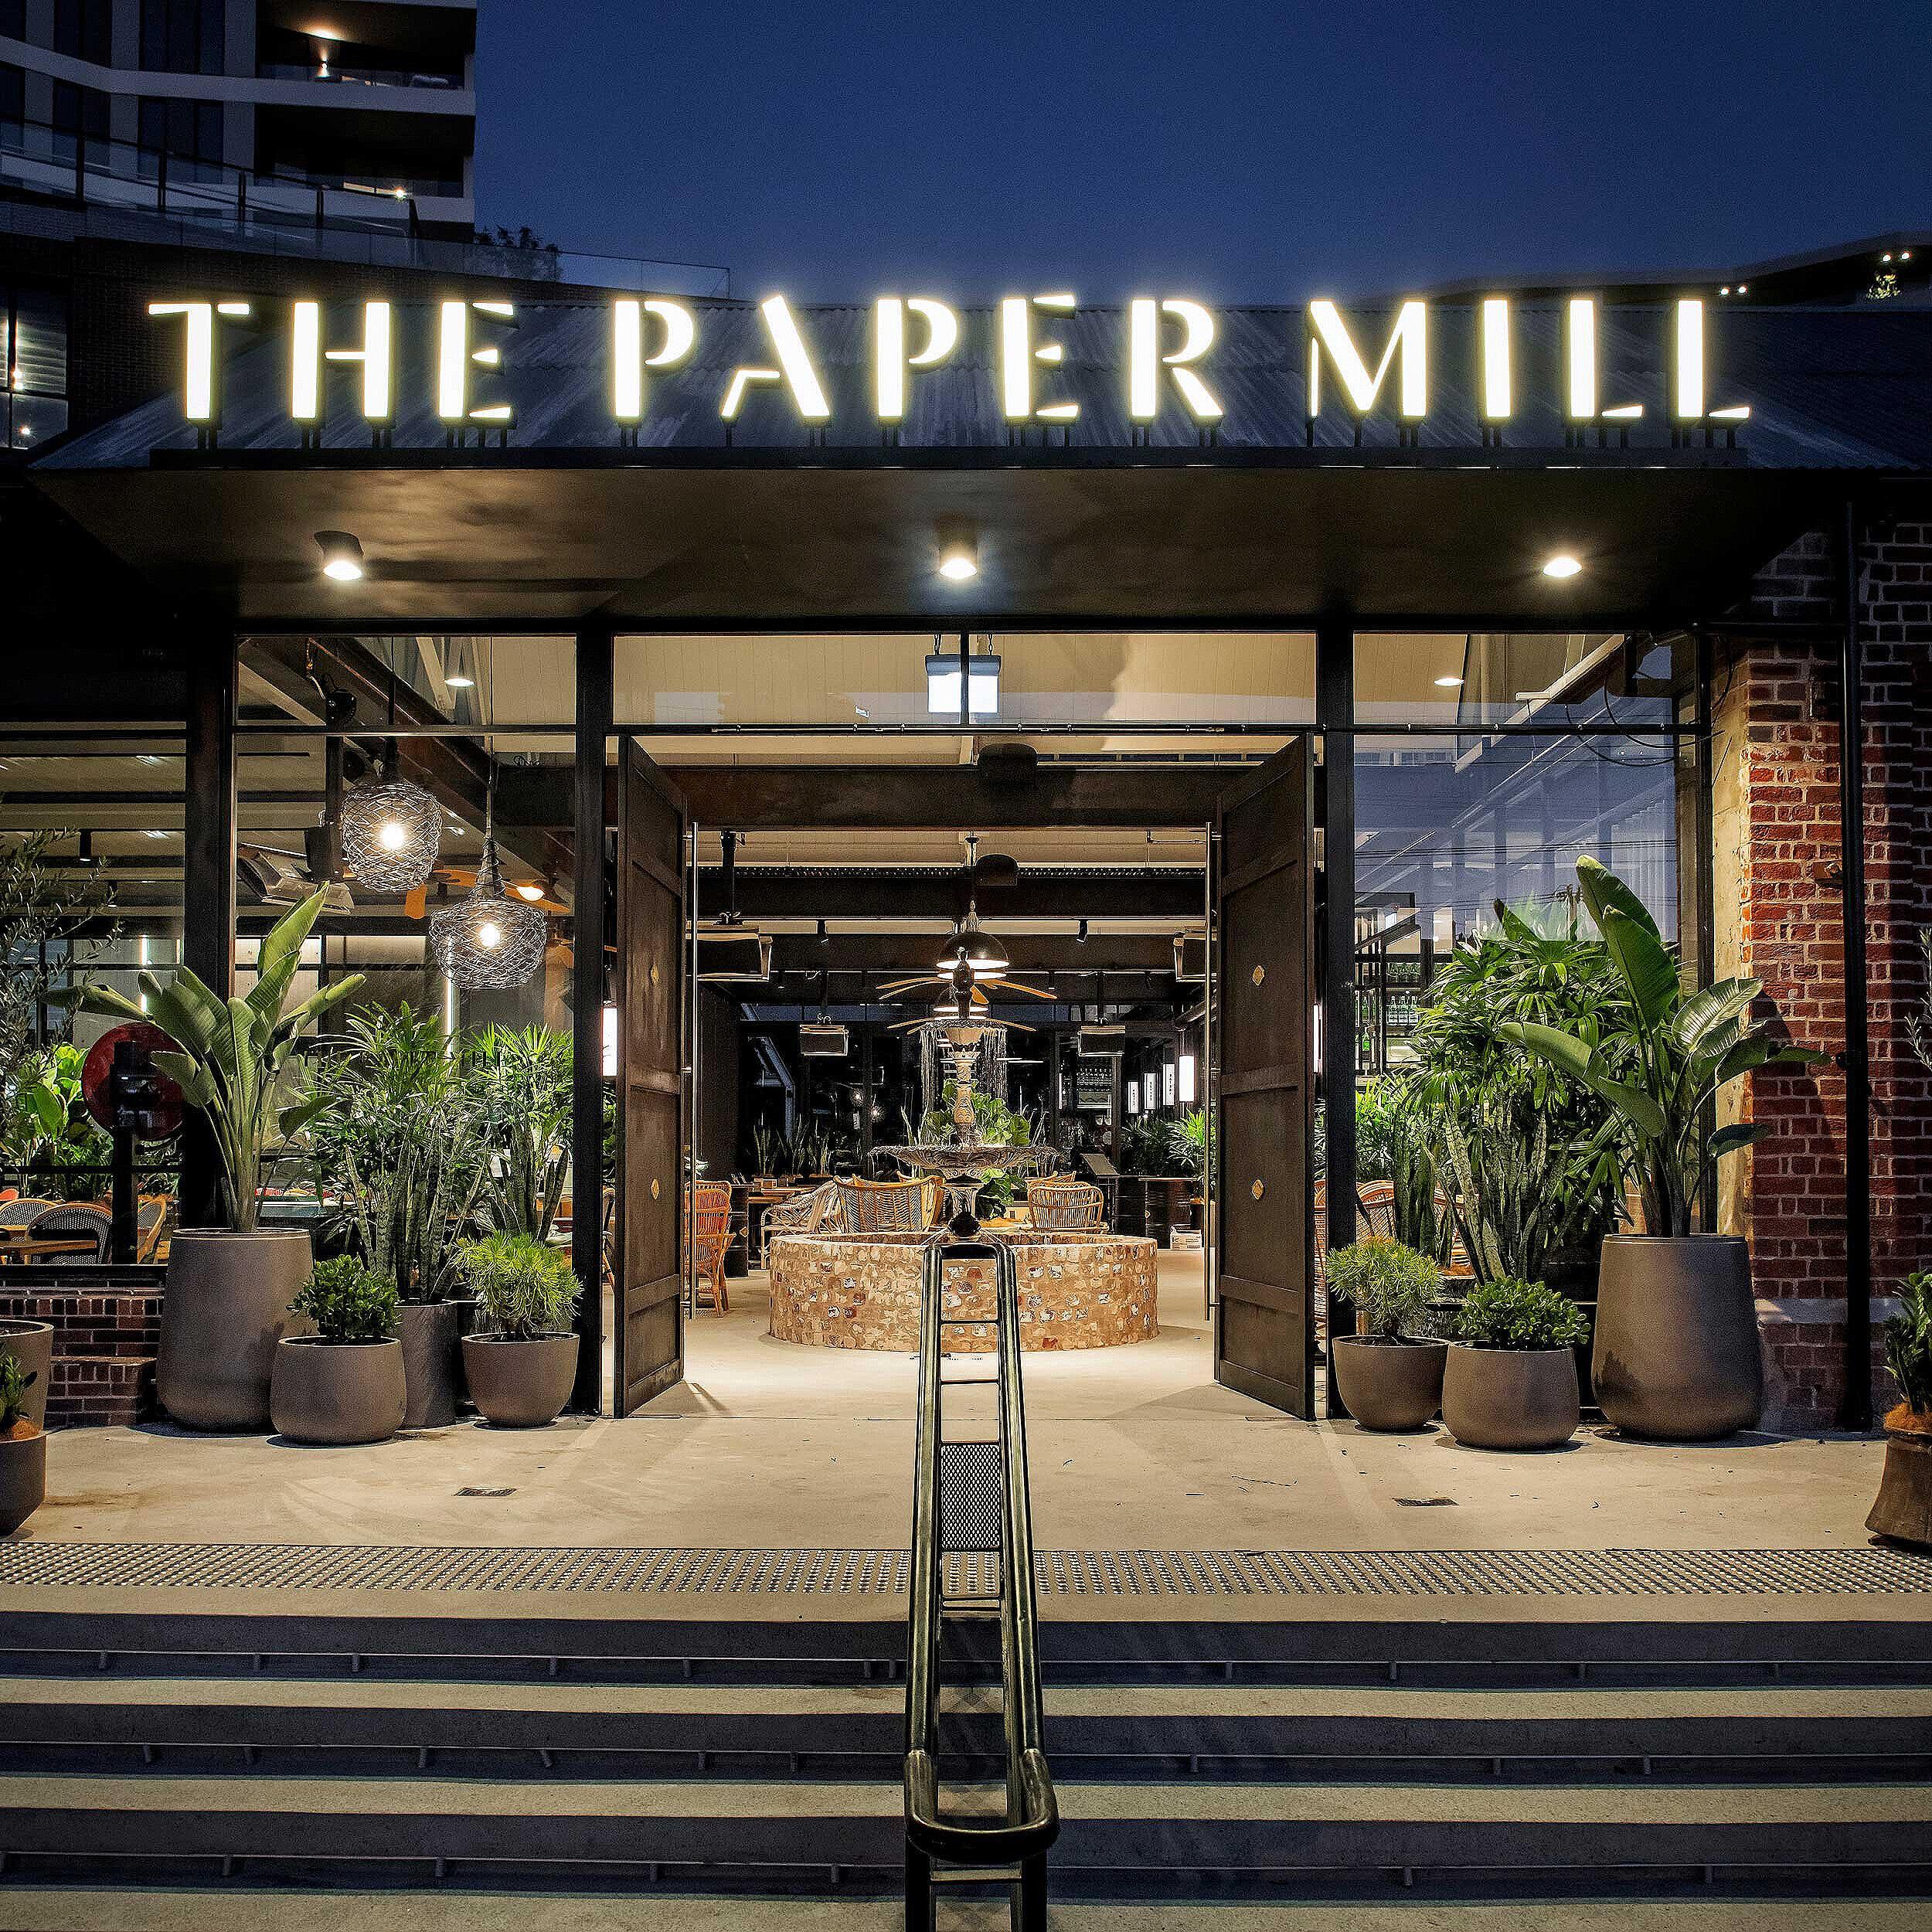 The-Paper-Mill-Food-Branding-Design-Handle_3.jpg